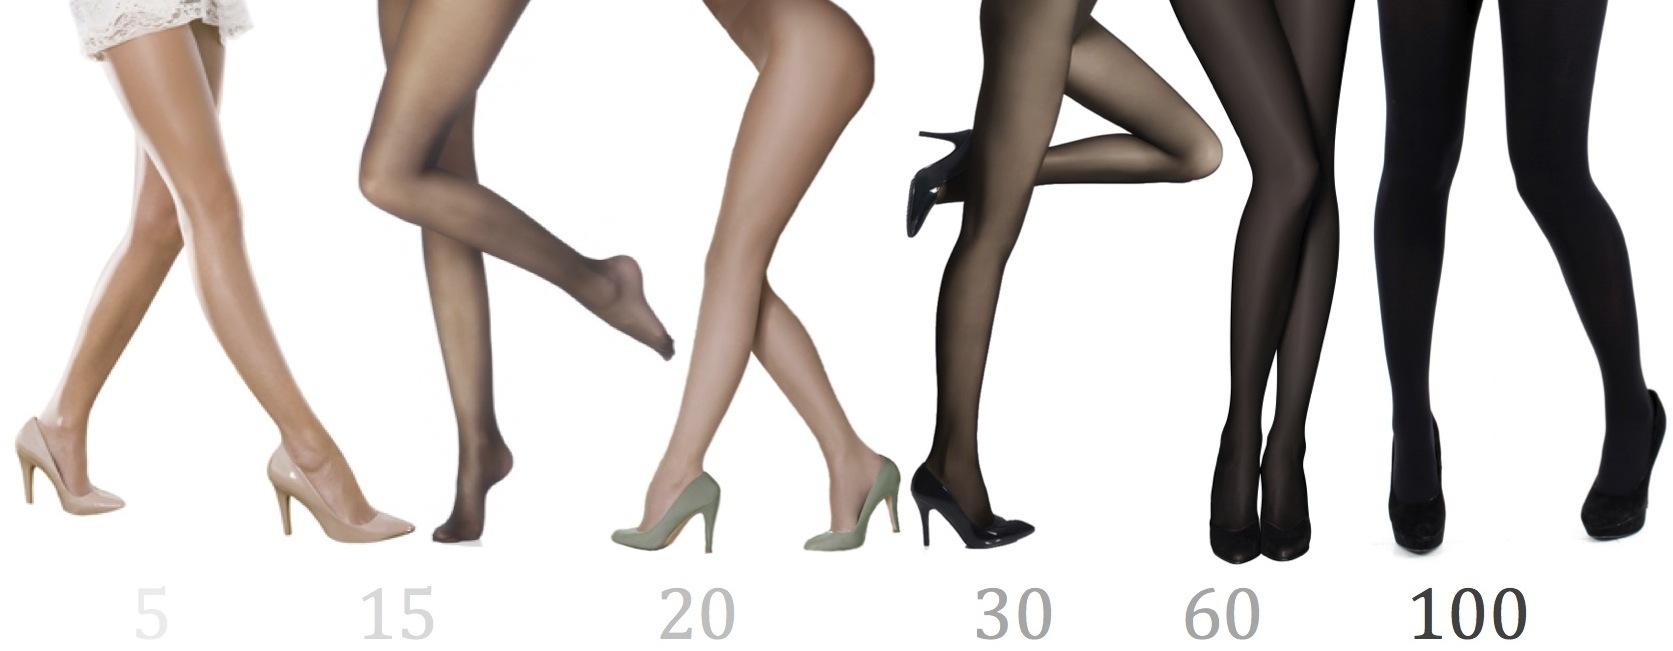 pantyhose risk chart